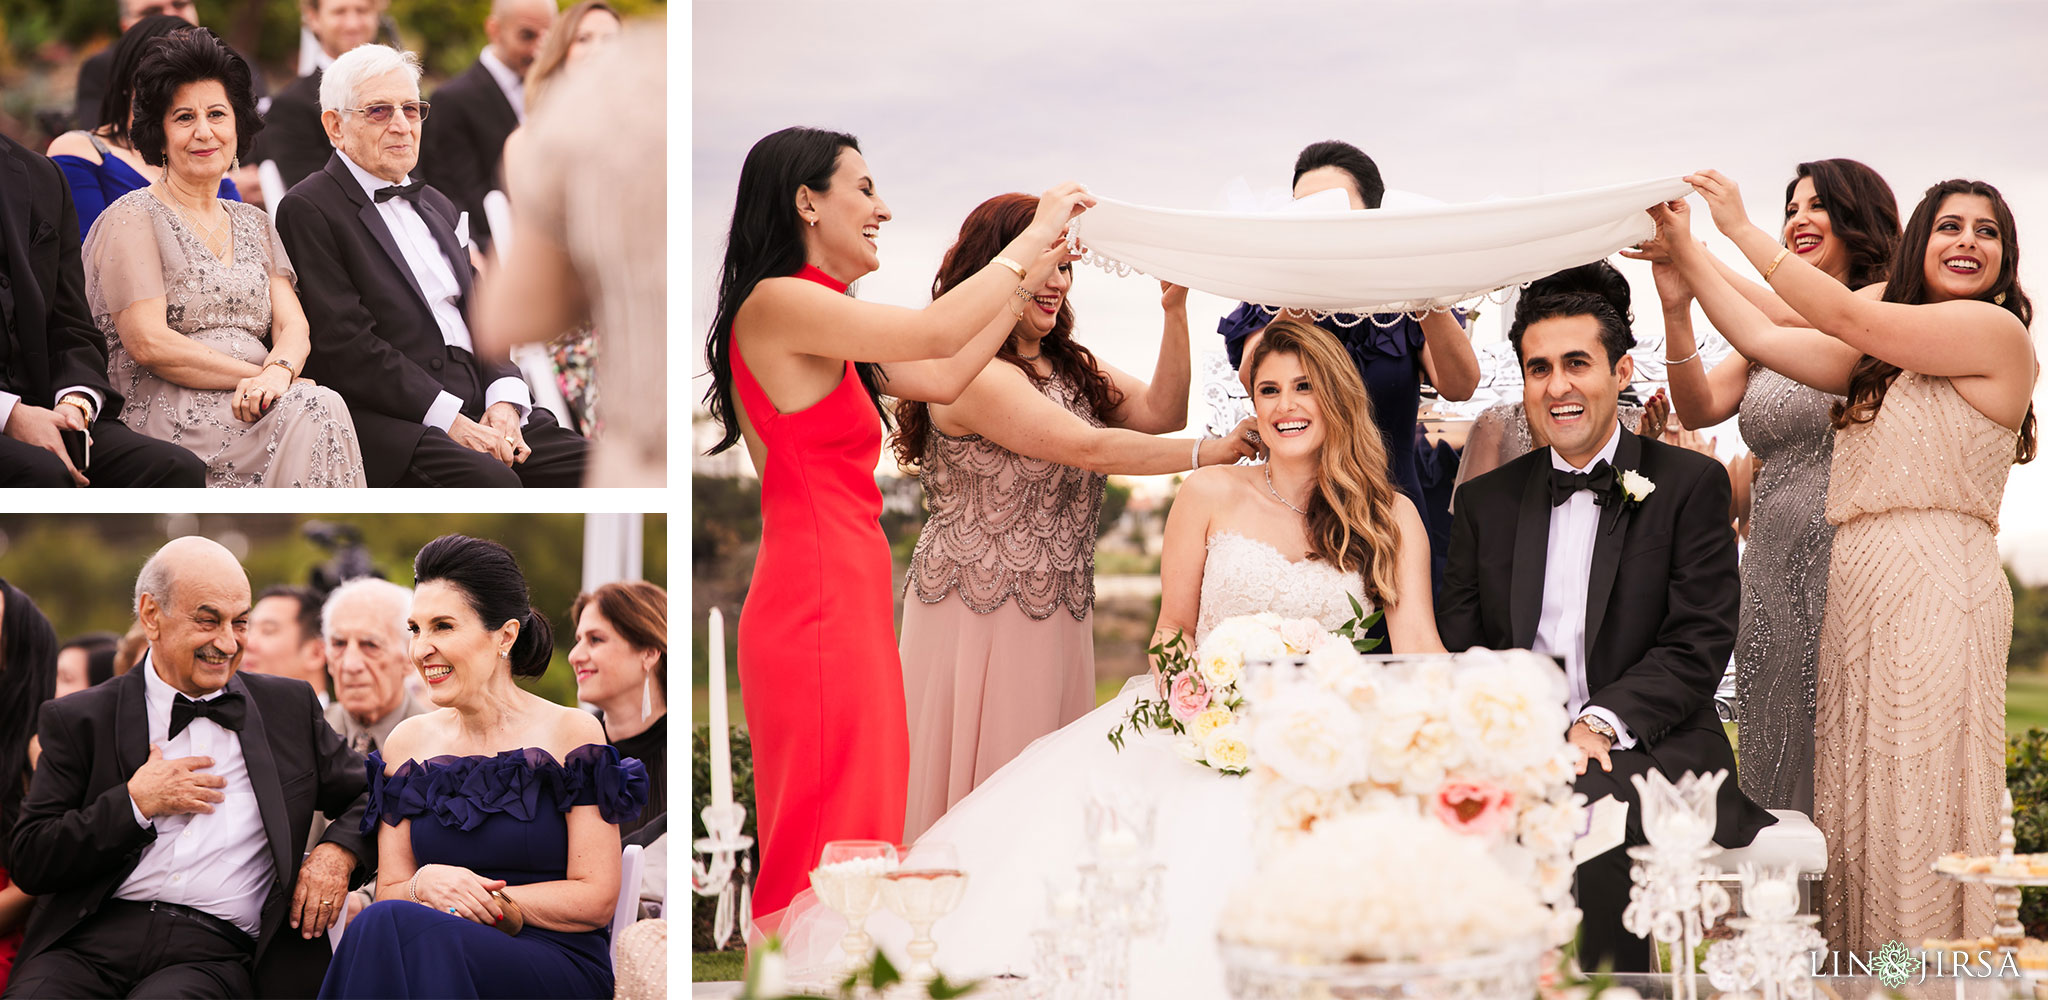 20 monarch beach resort laguna niguel persian wedding photography